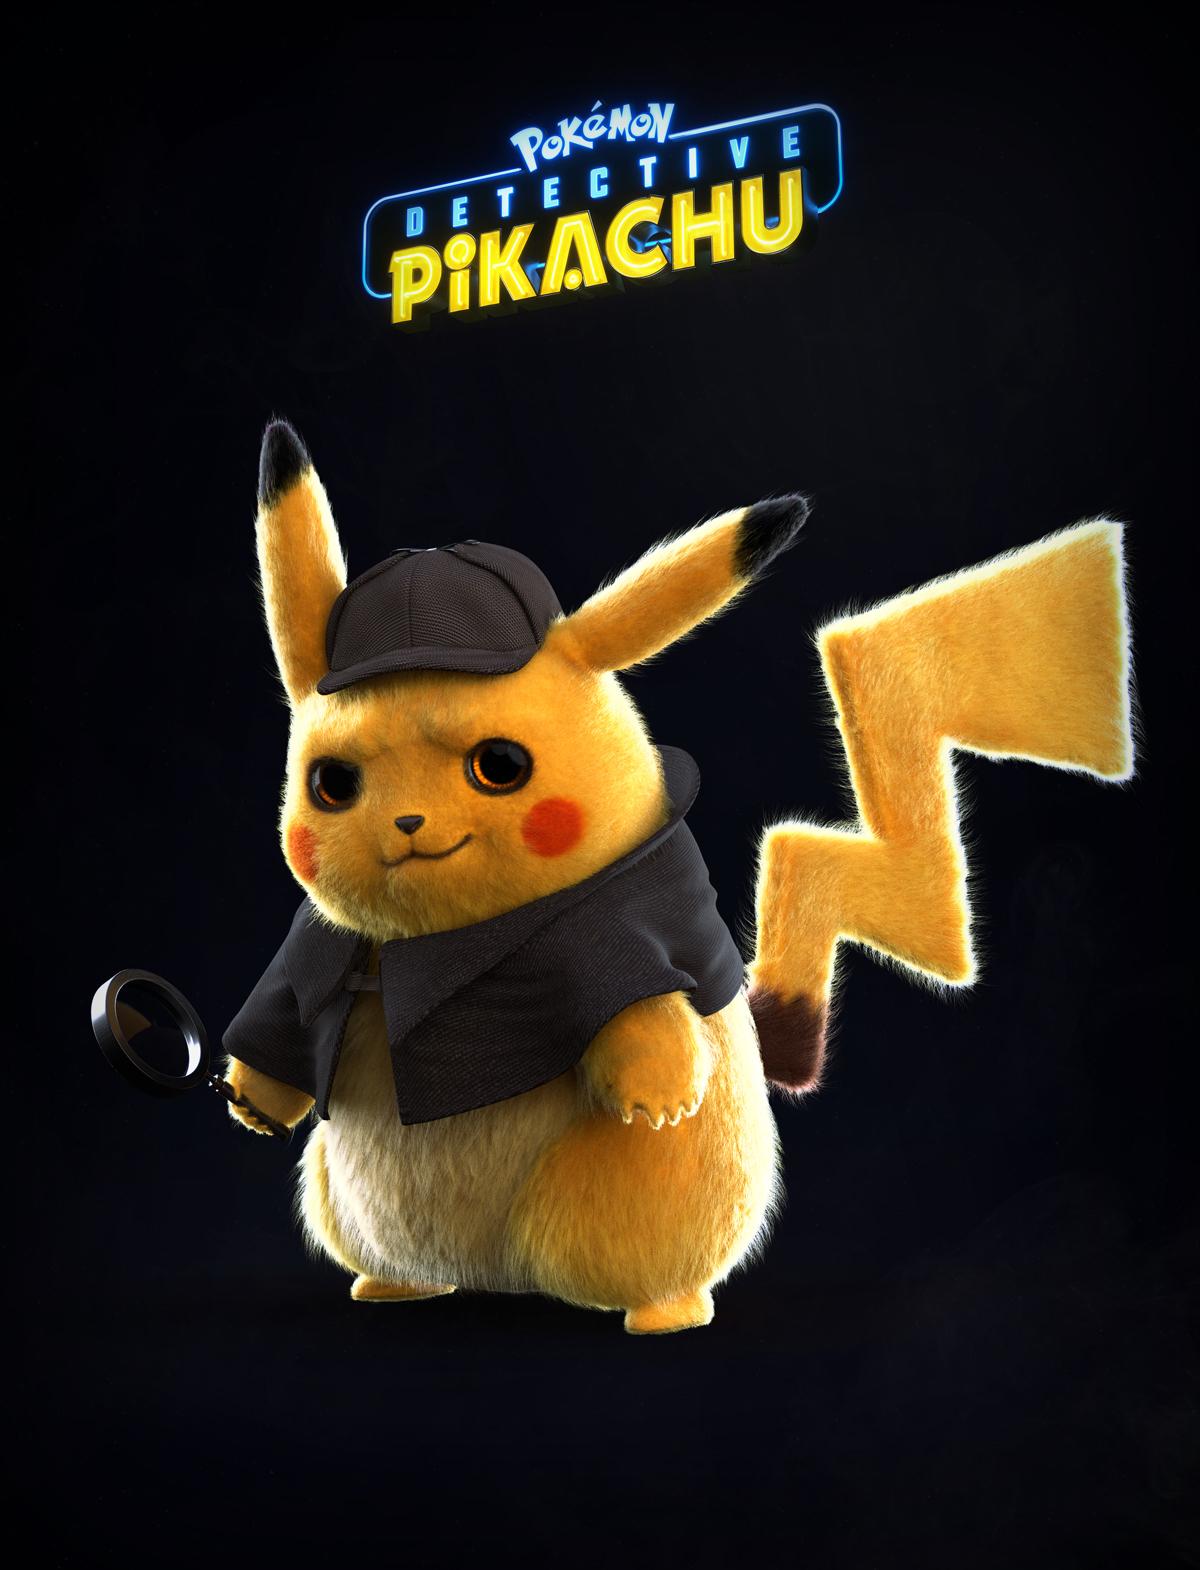 Pikachu Detective By Redorb333 Fan Art 3d Cgsociety